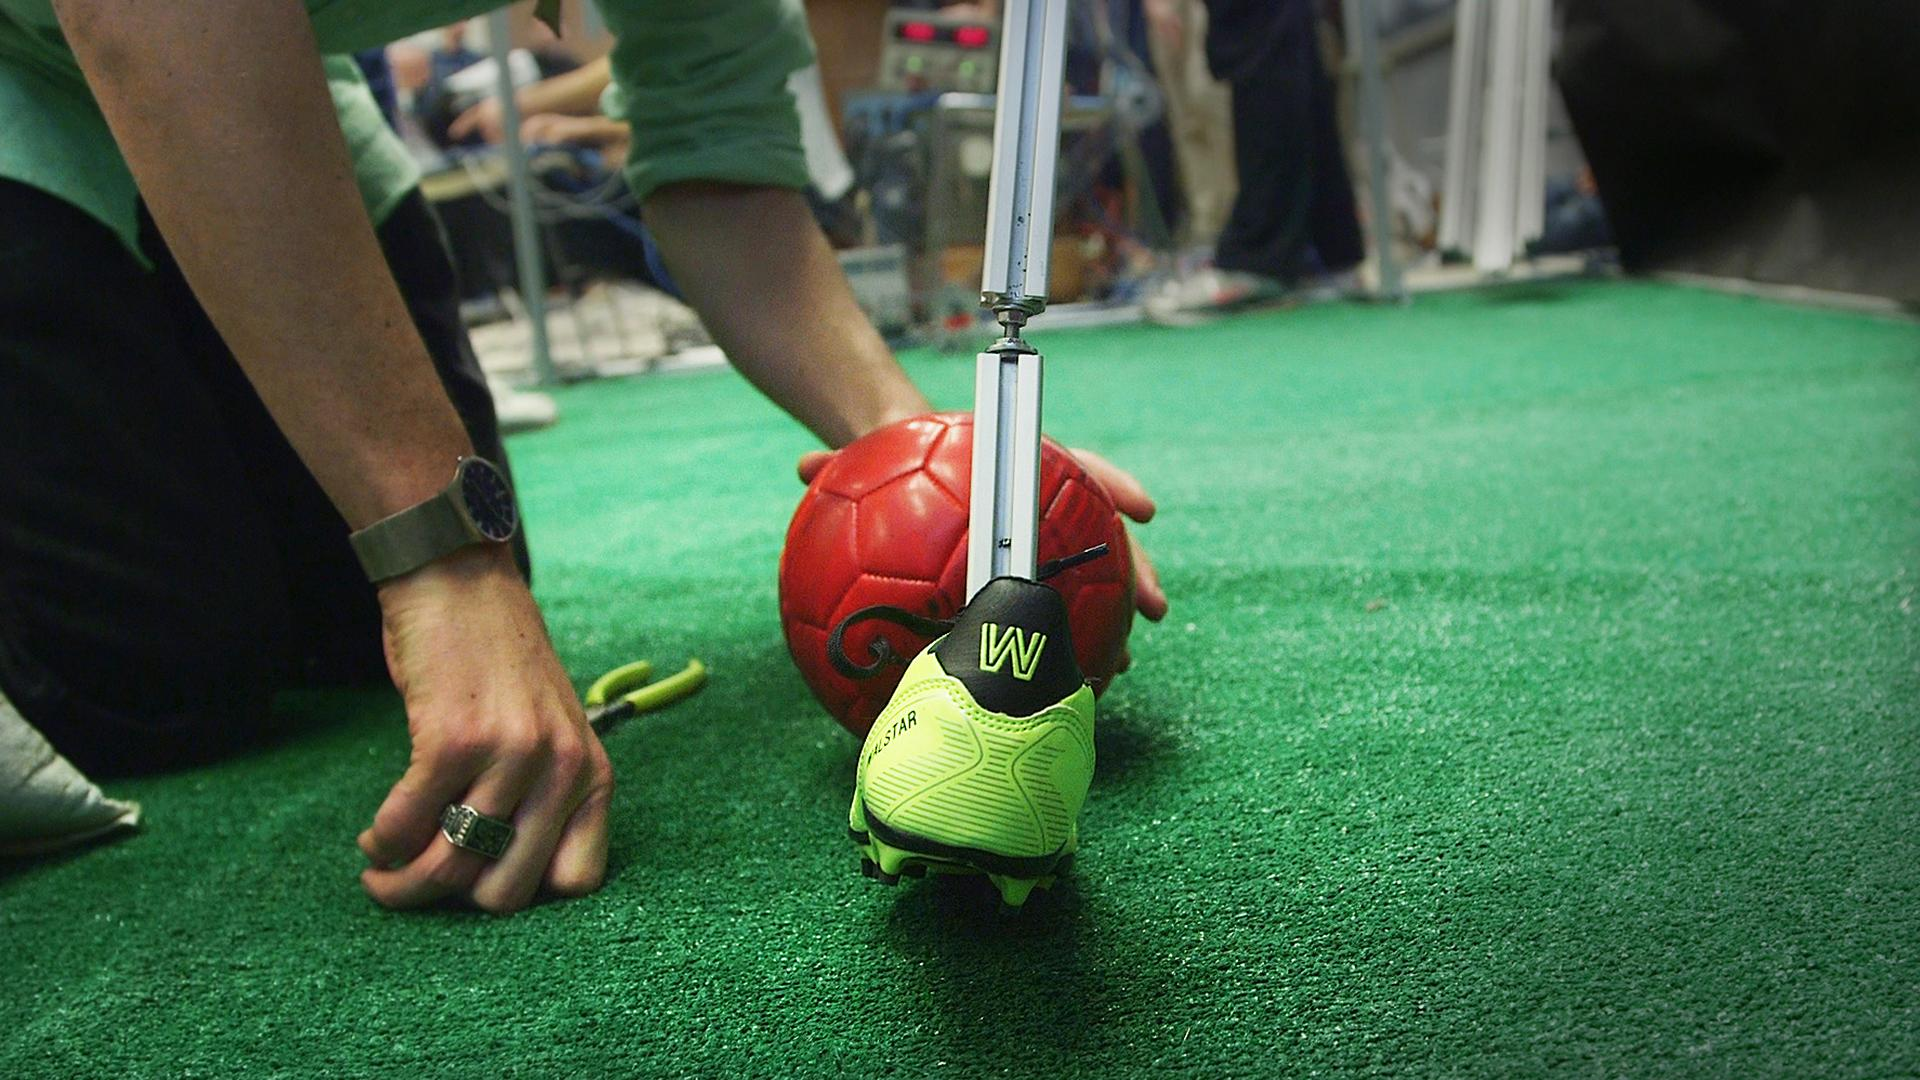 2.12: Introduction to Robotics at MIT